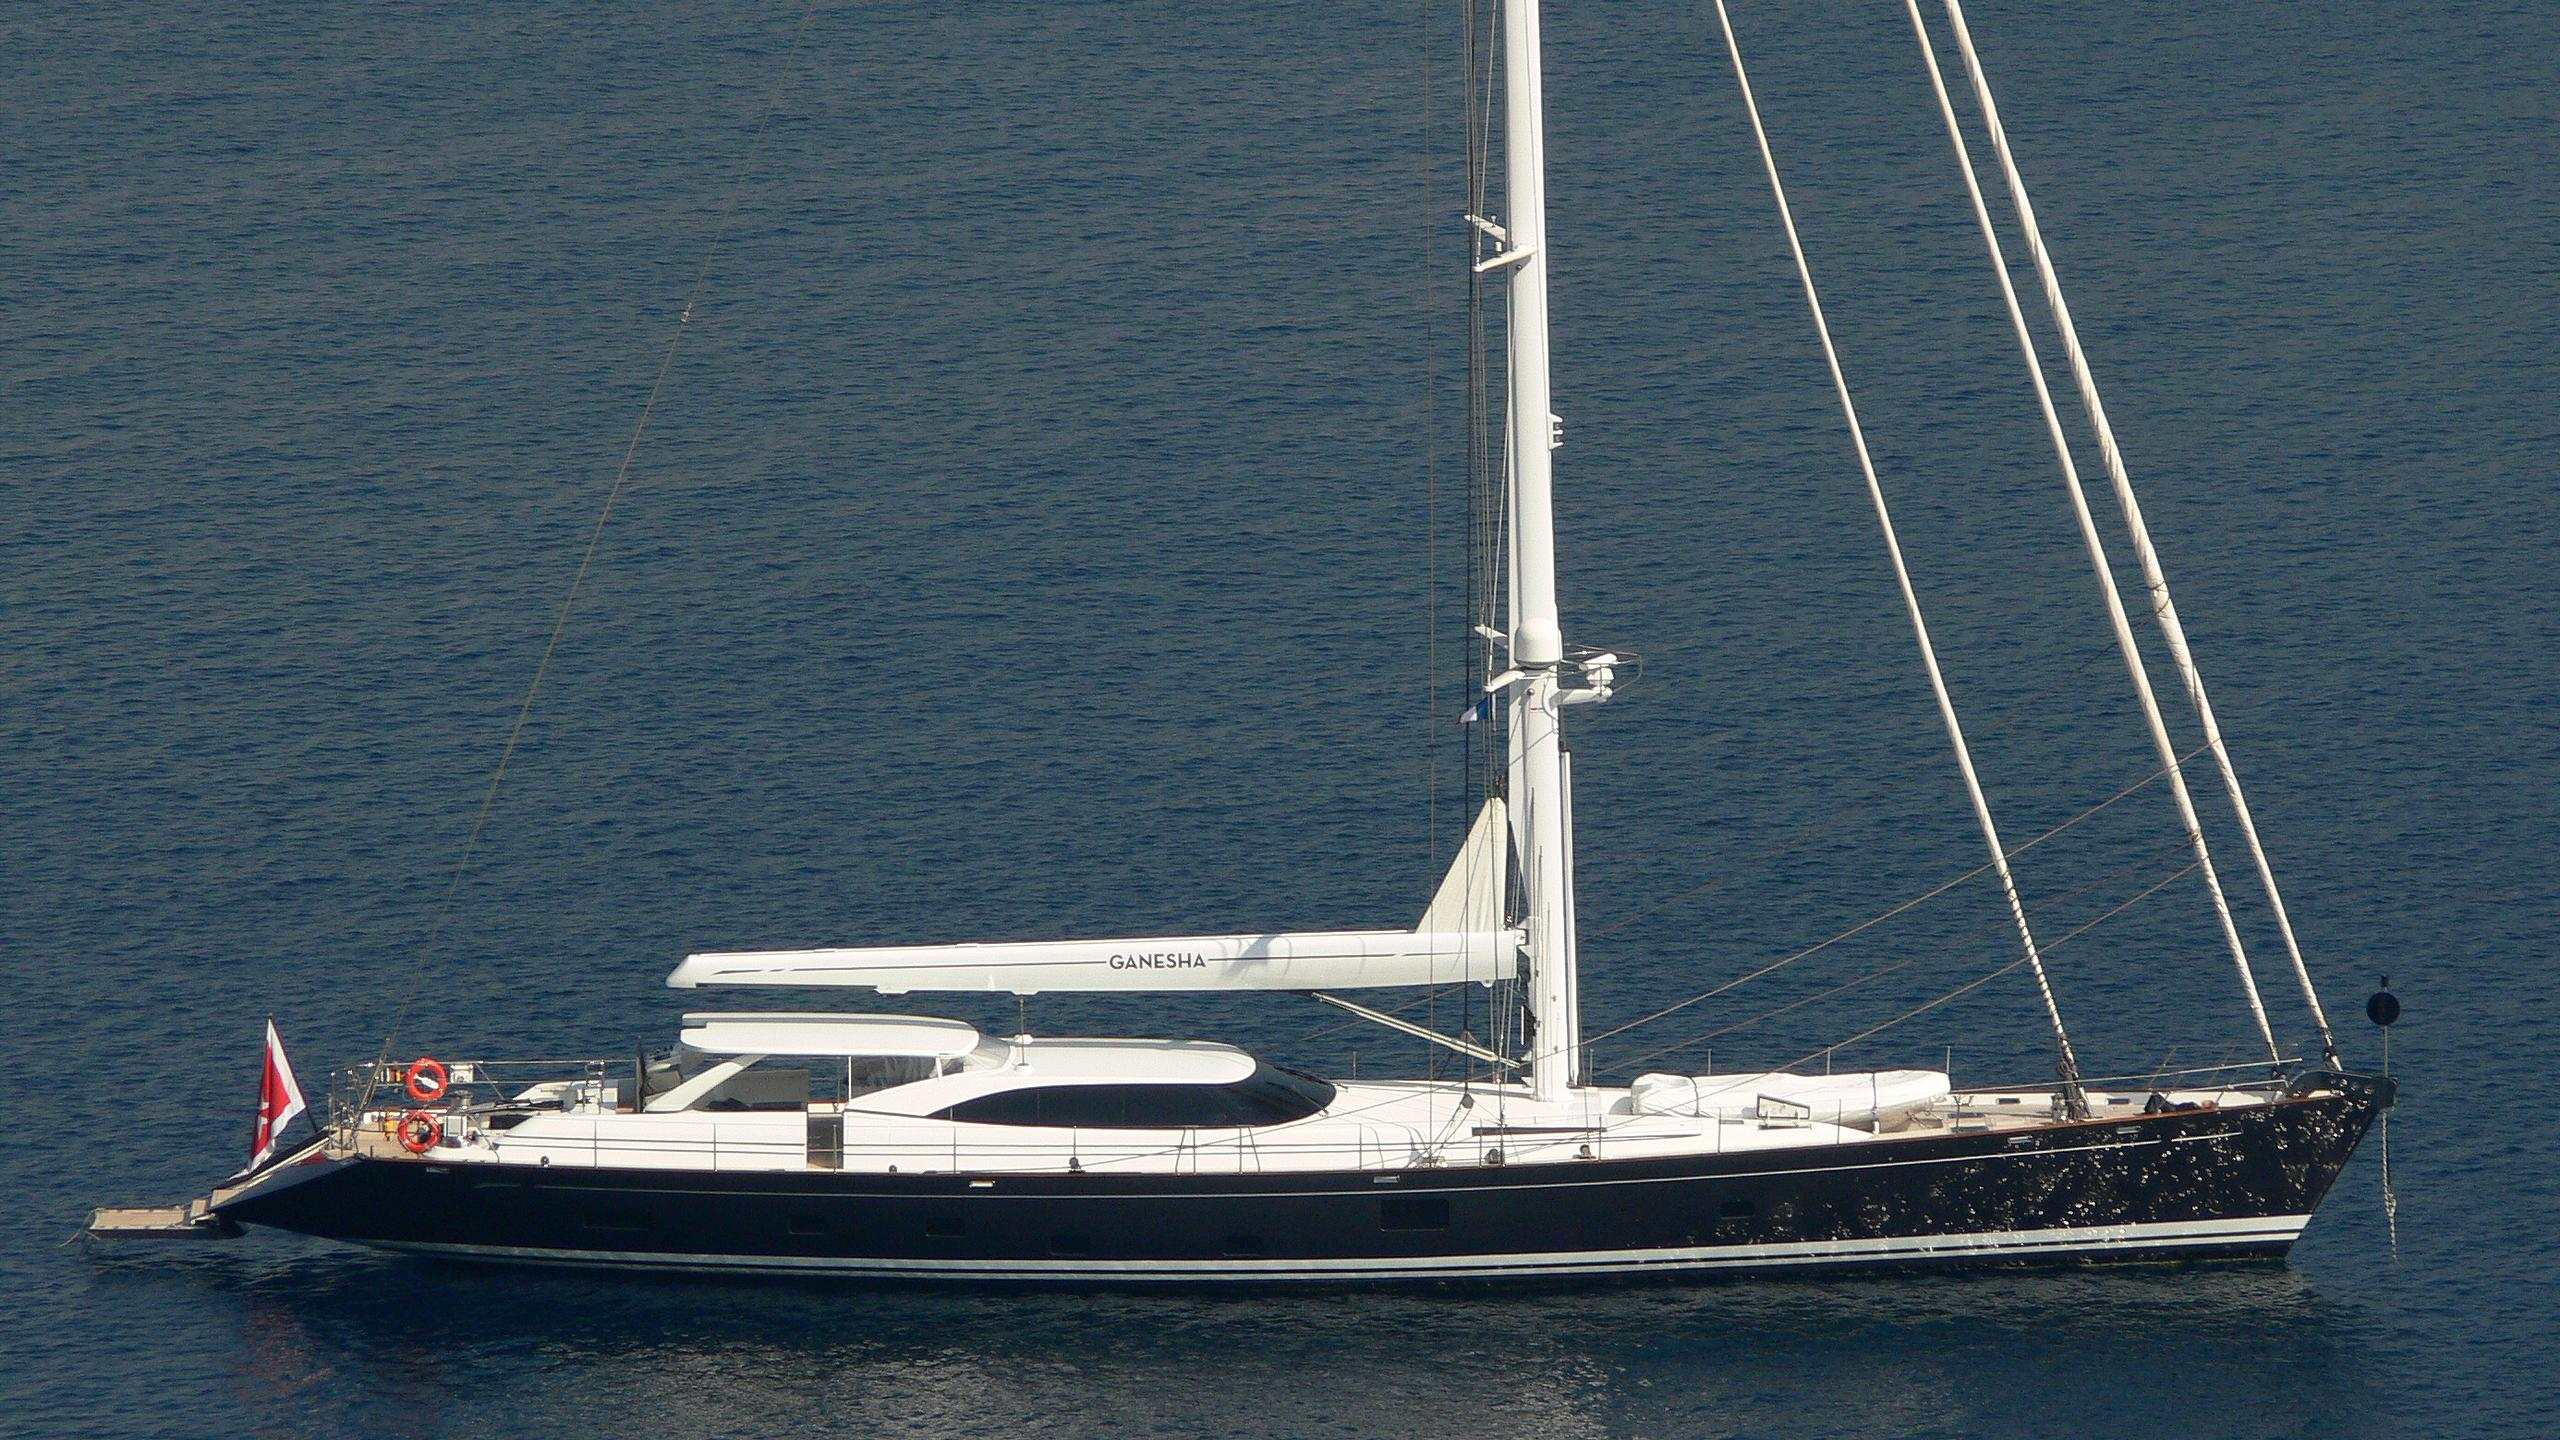 mia cara ganesha sailing yacht fitzroy yachts 39m 2006 profile